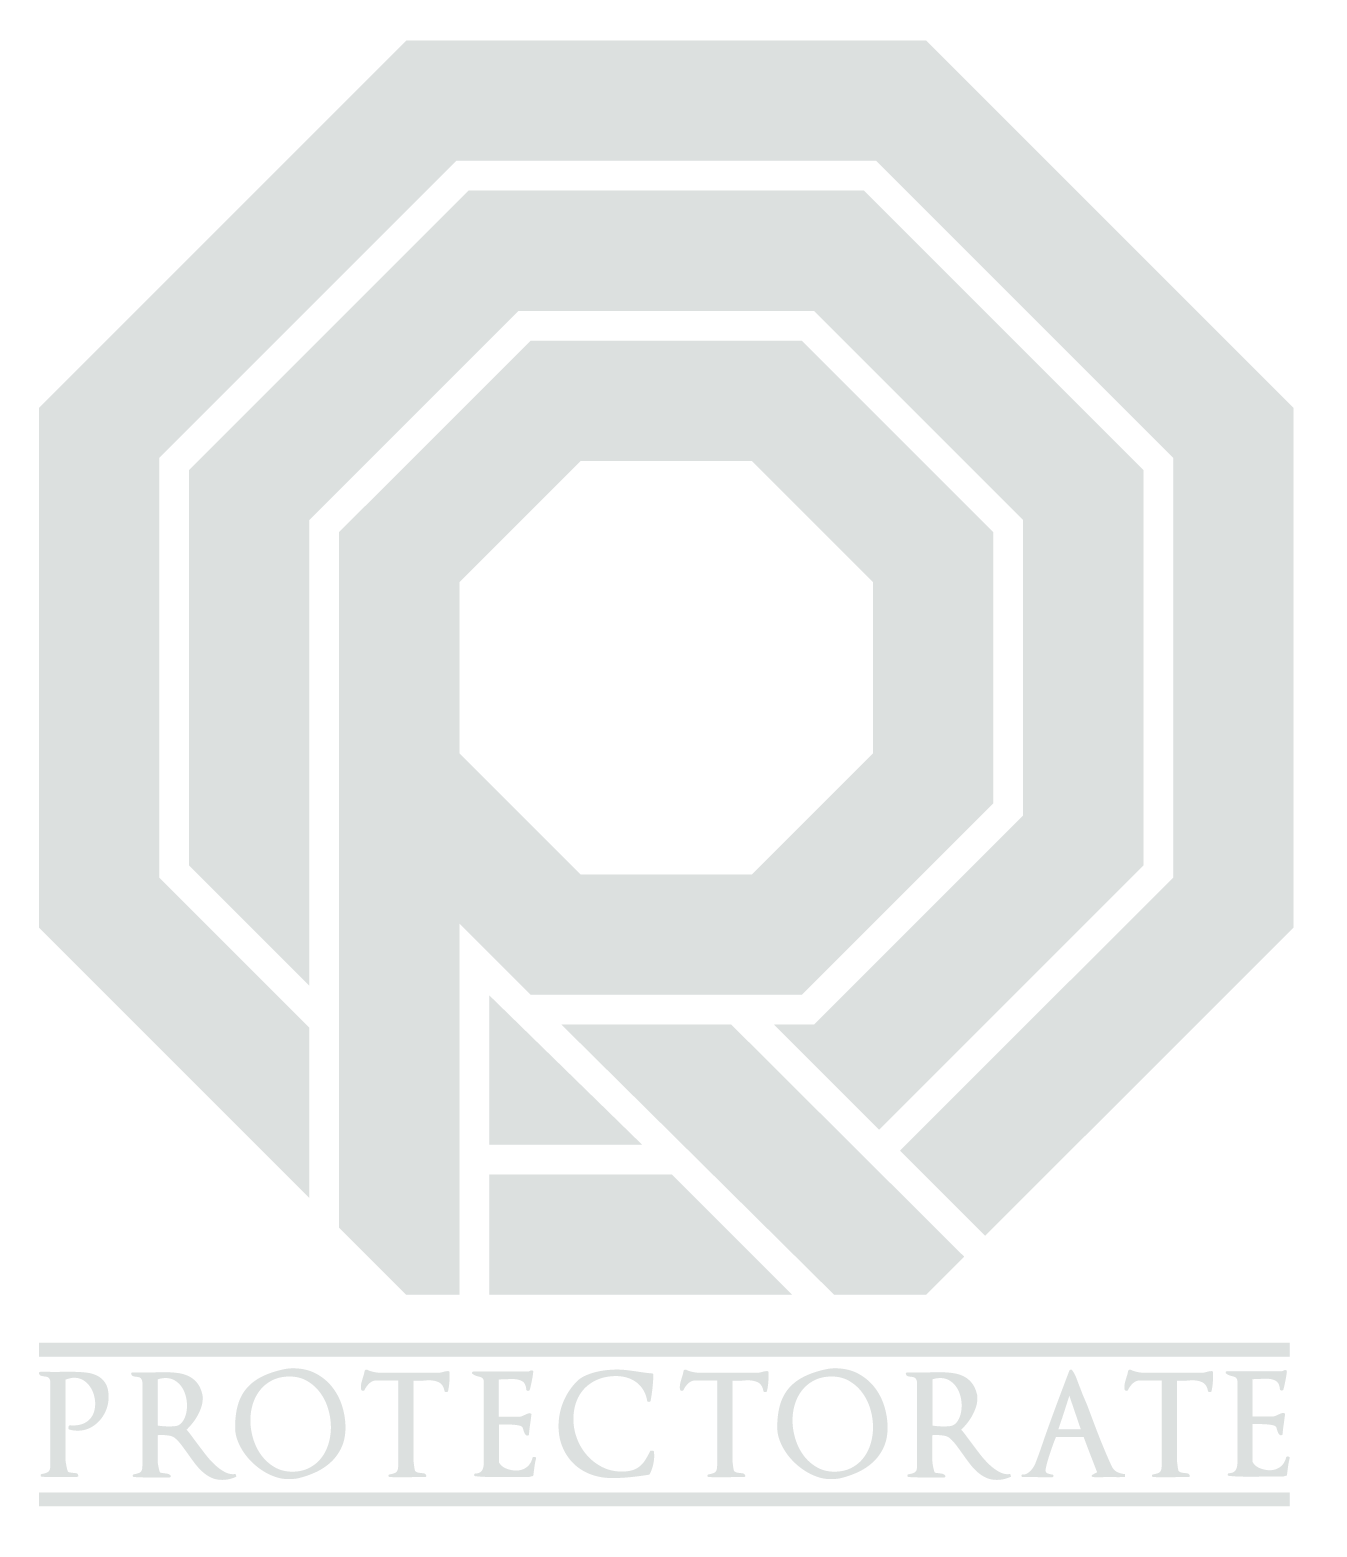 Protectorate logo